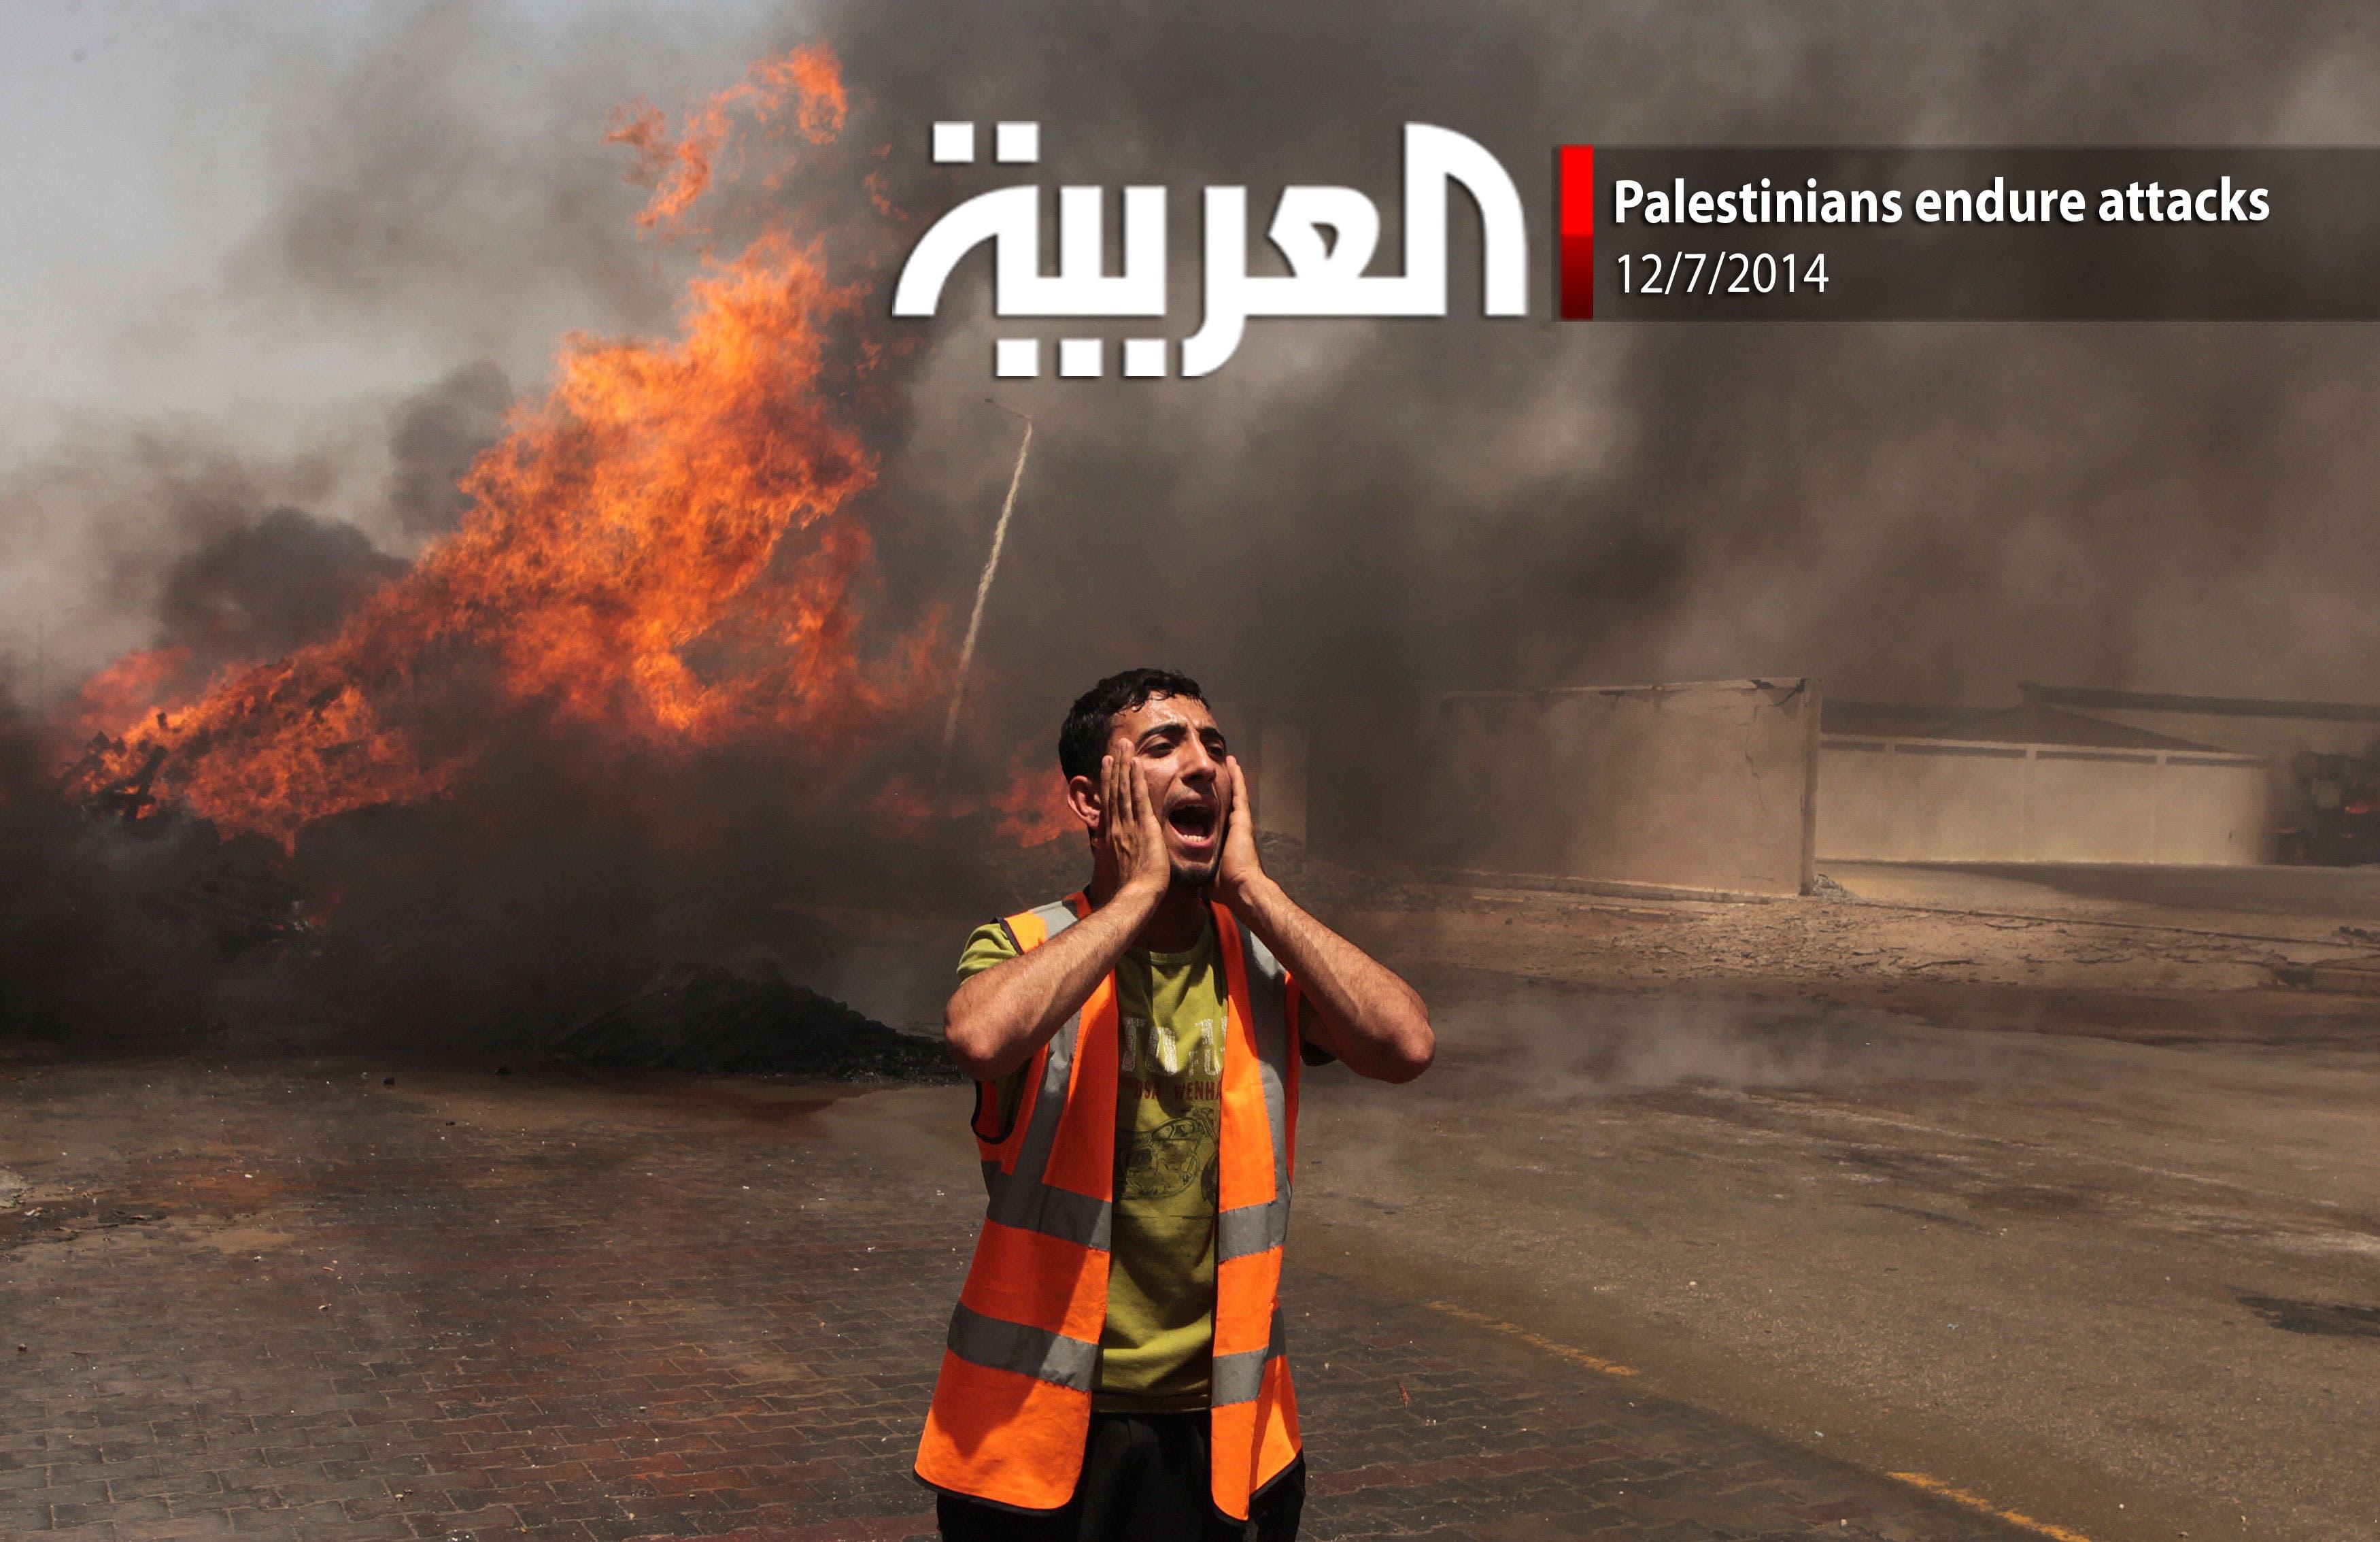 Palestinians endure attacks